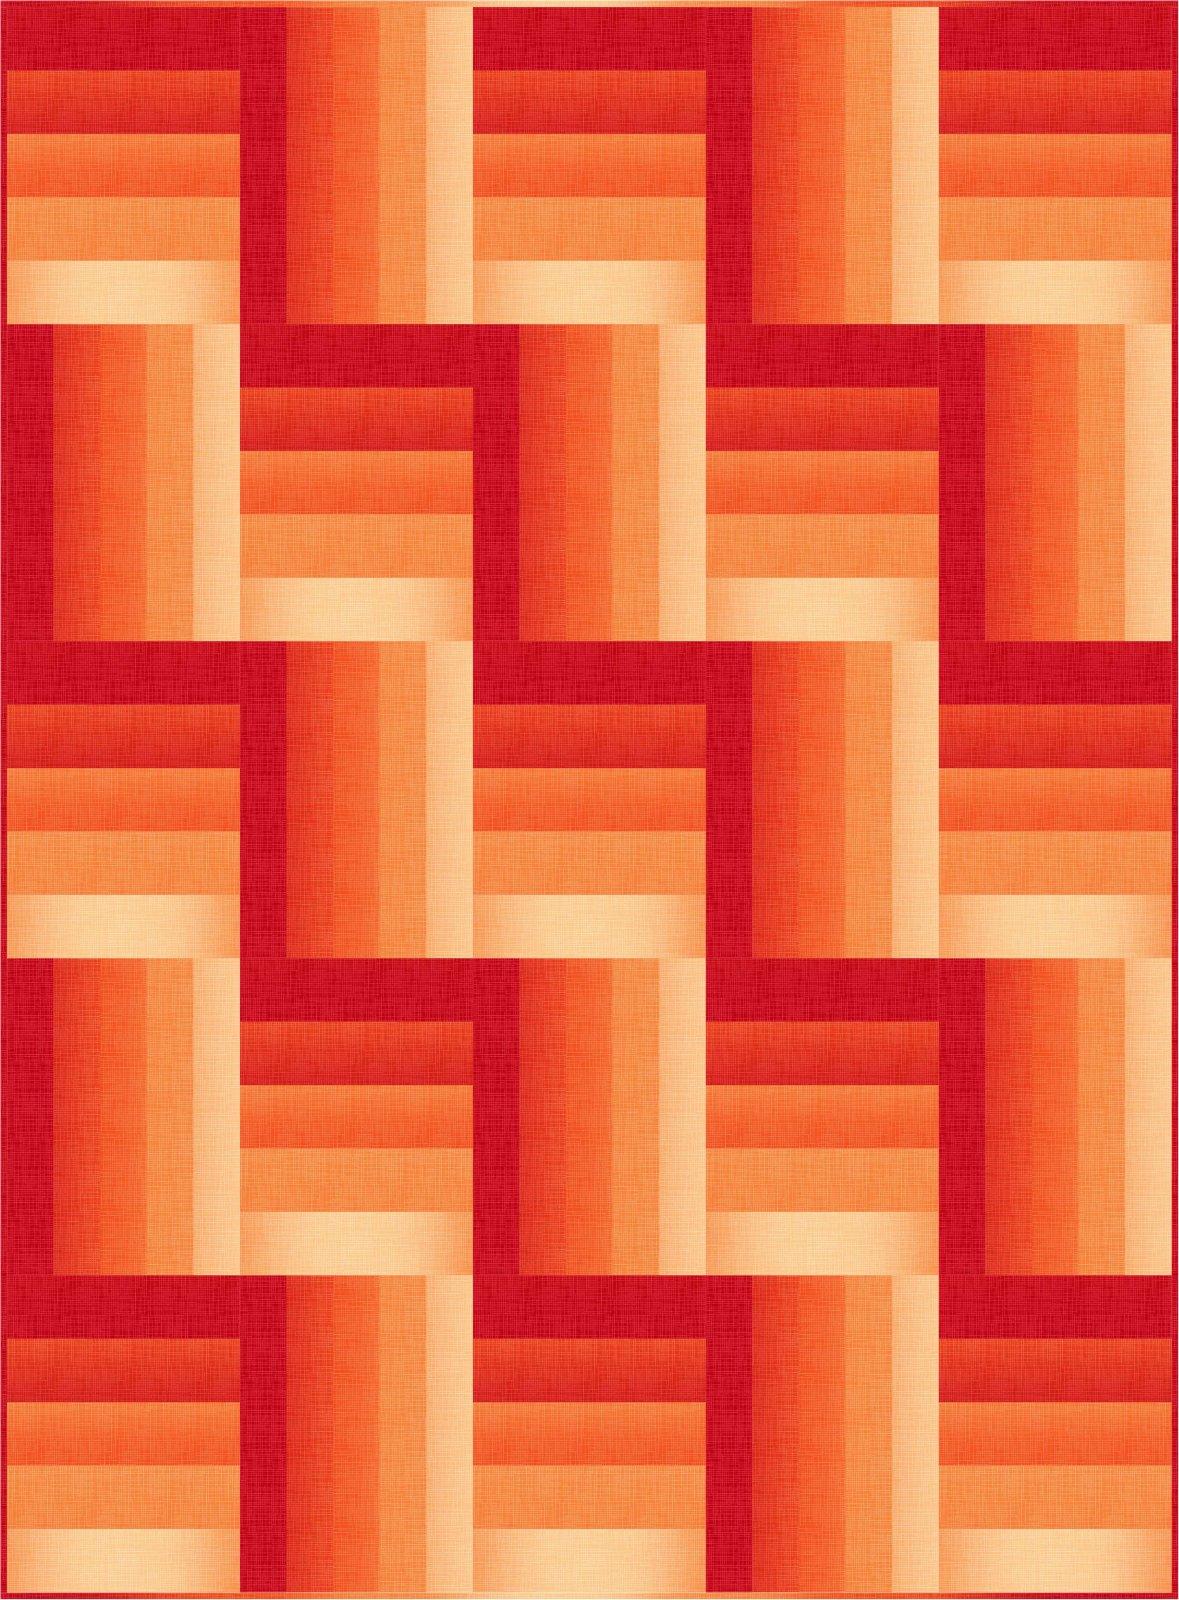 Strata Kit Orange